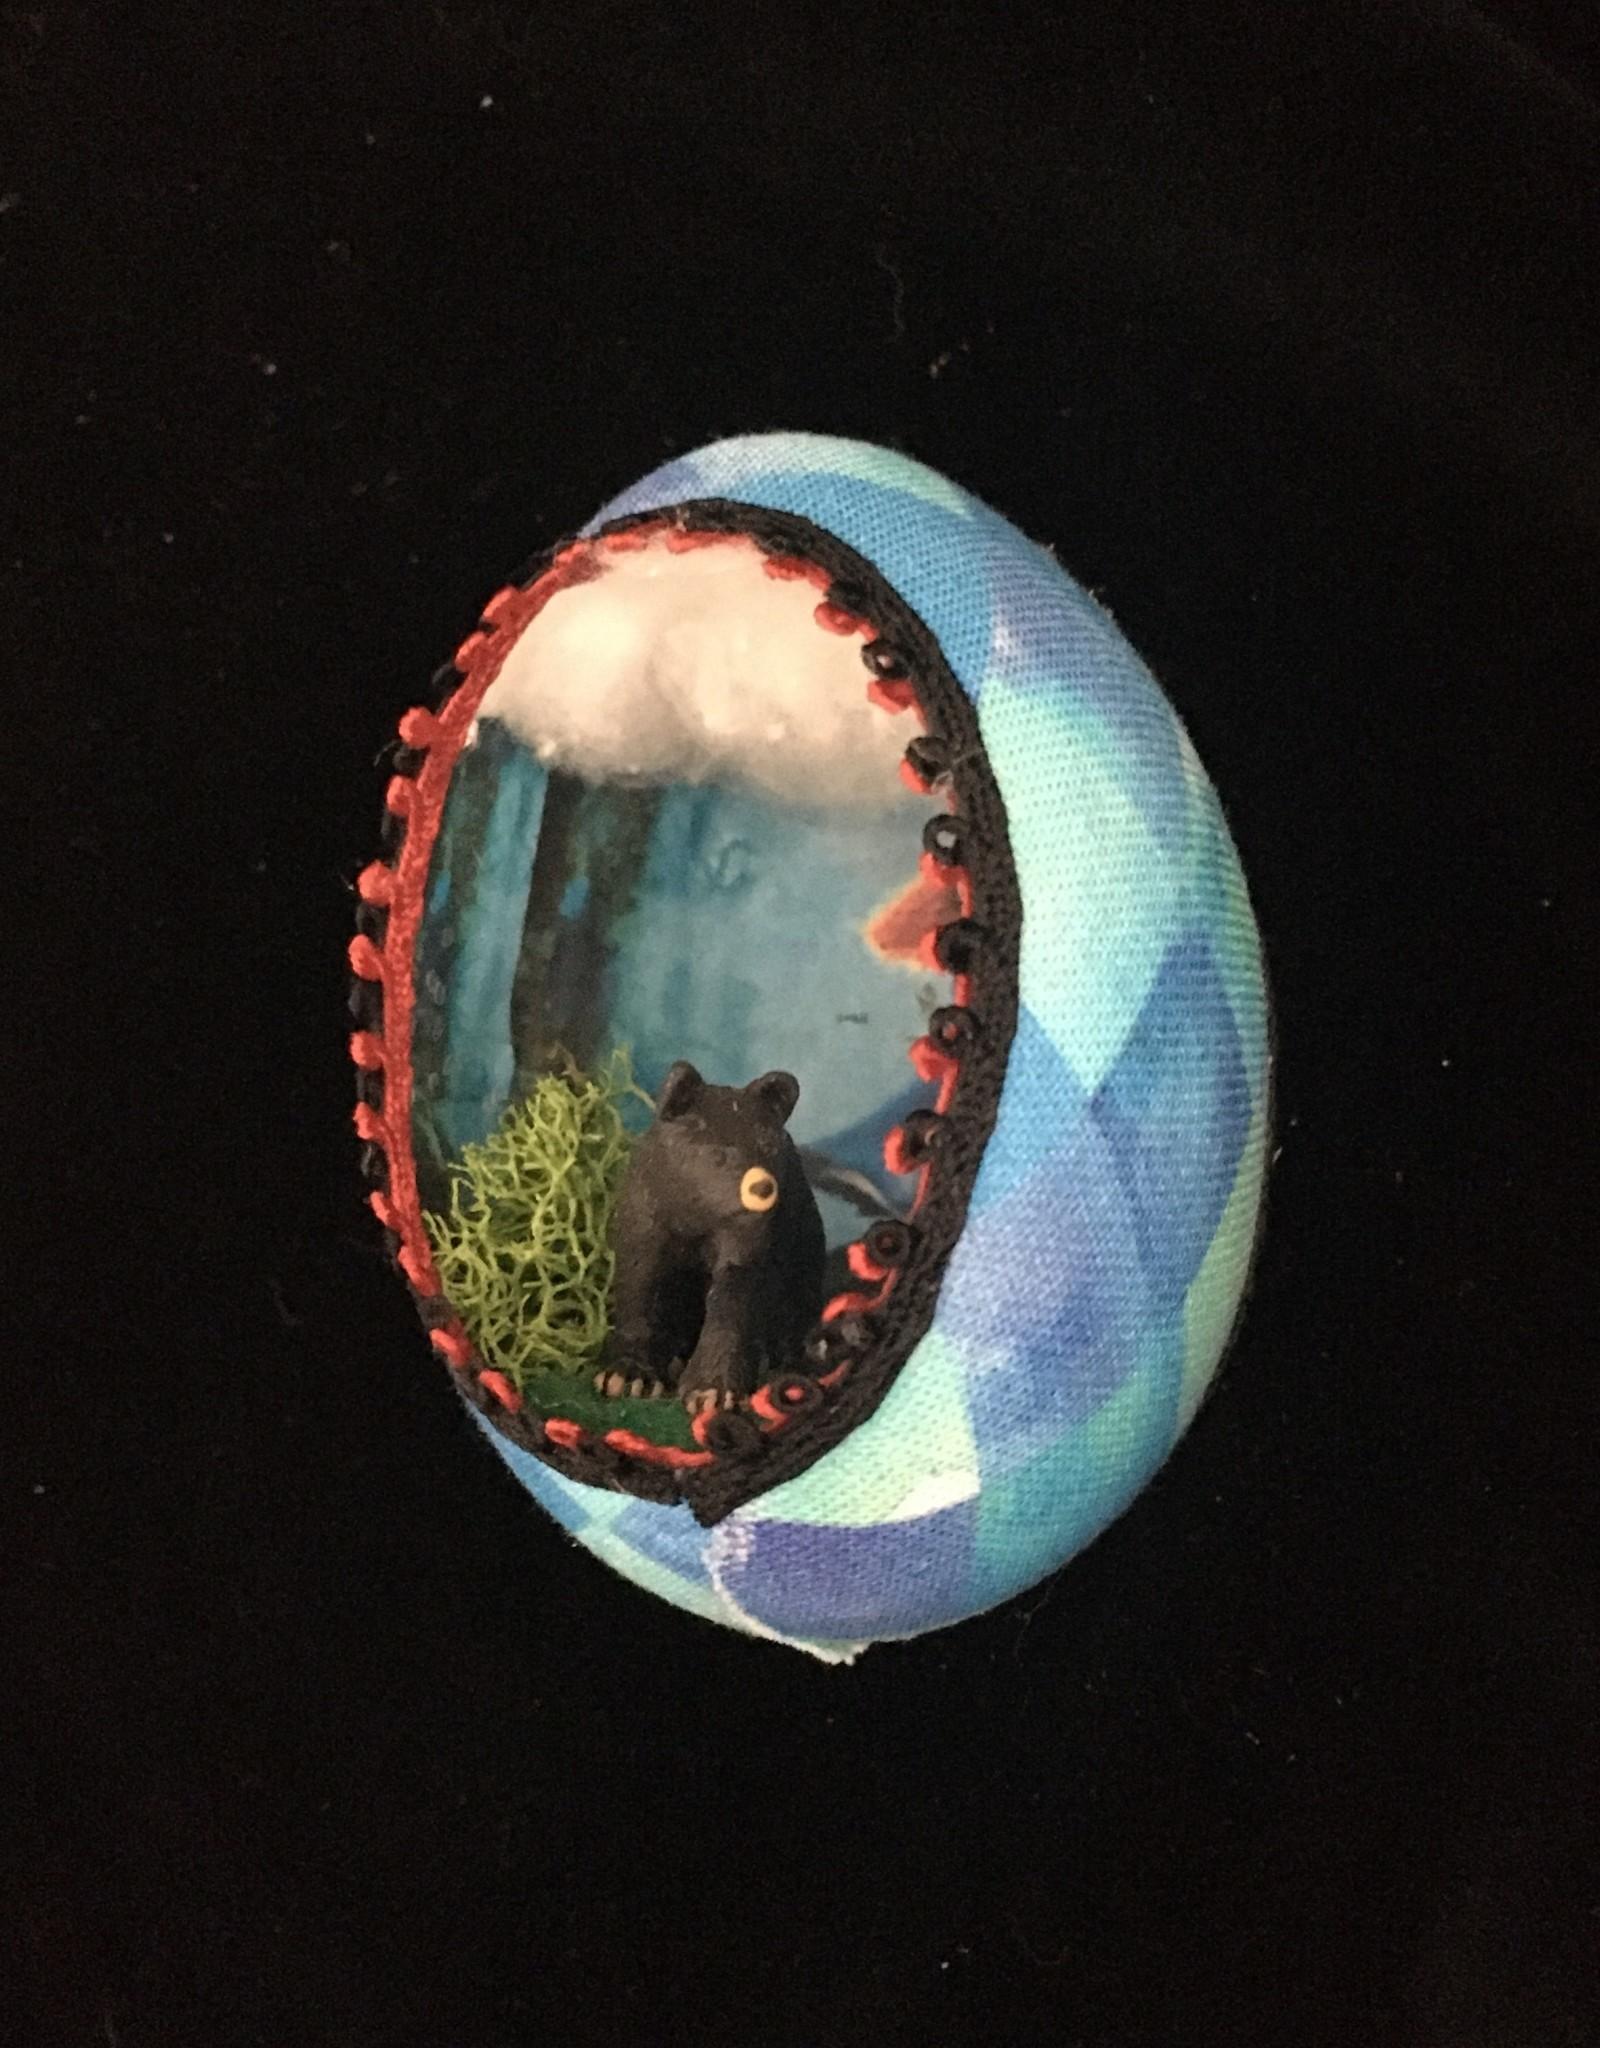 Ammi Brooks Brave Real Egg Ornament